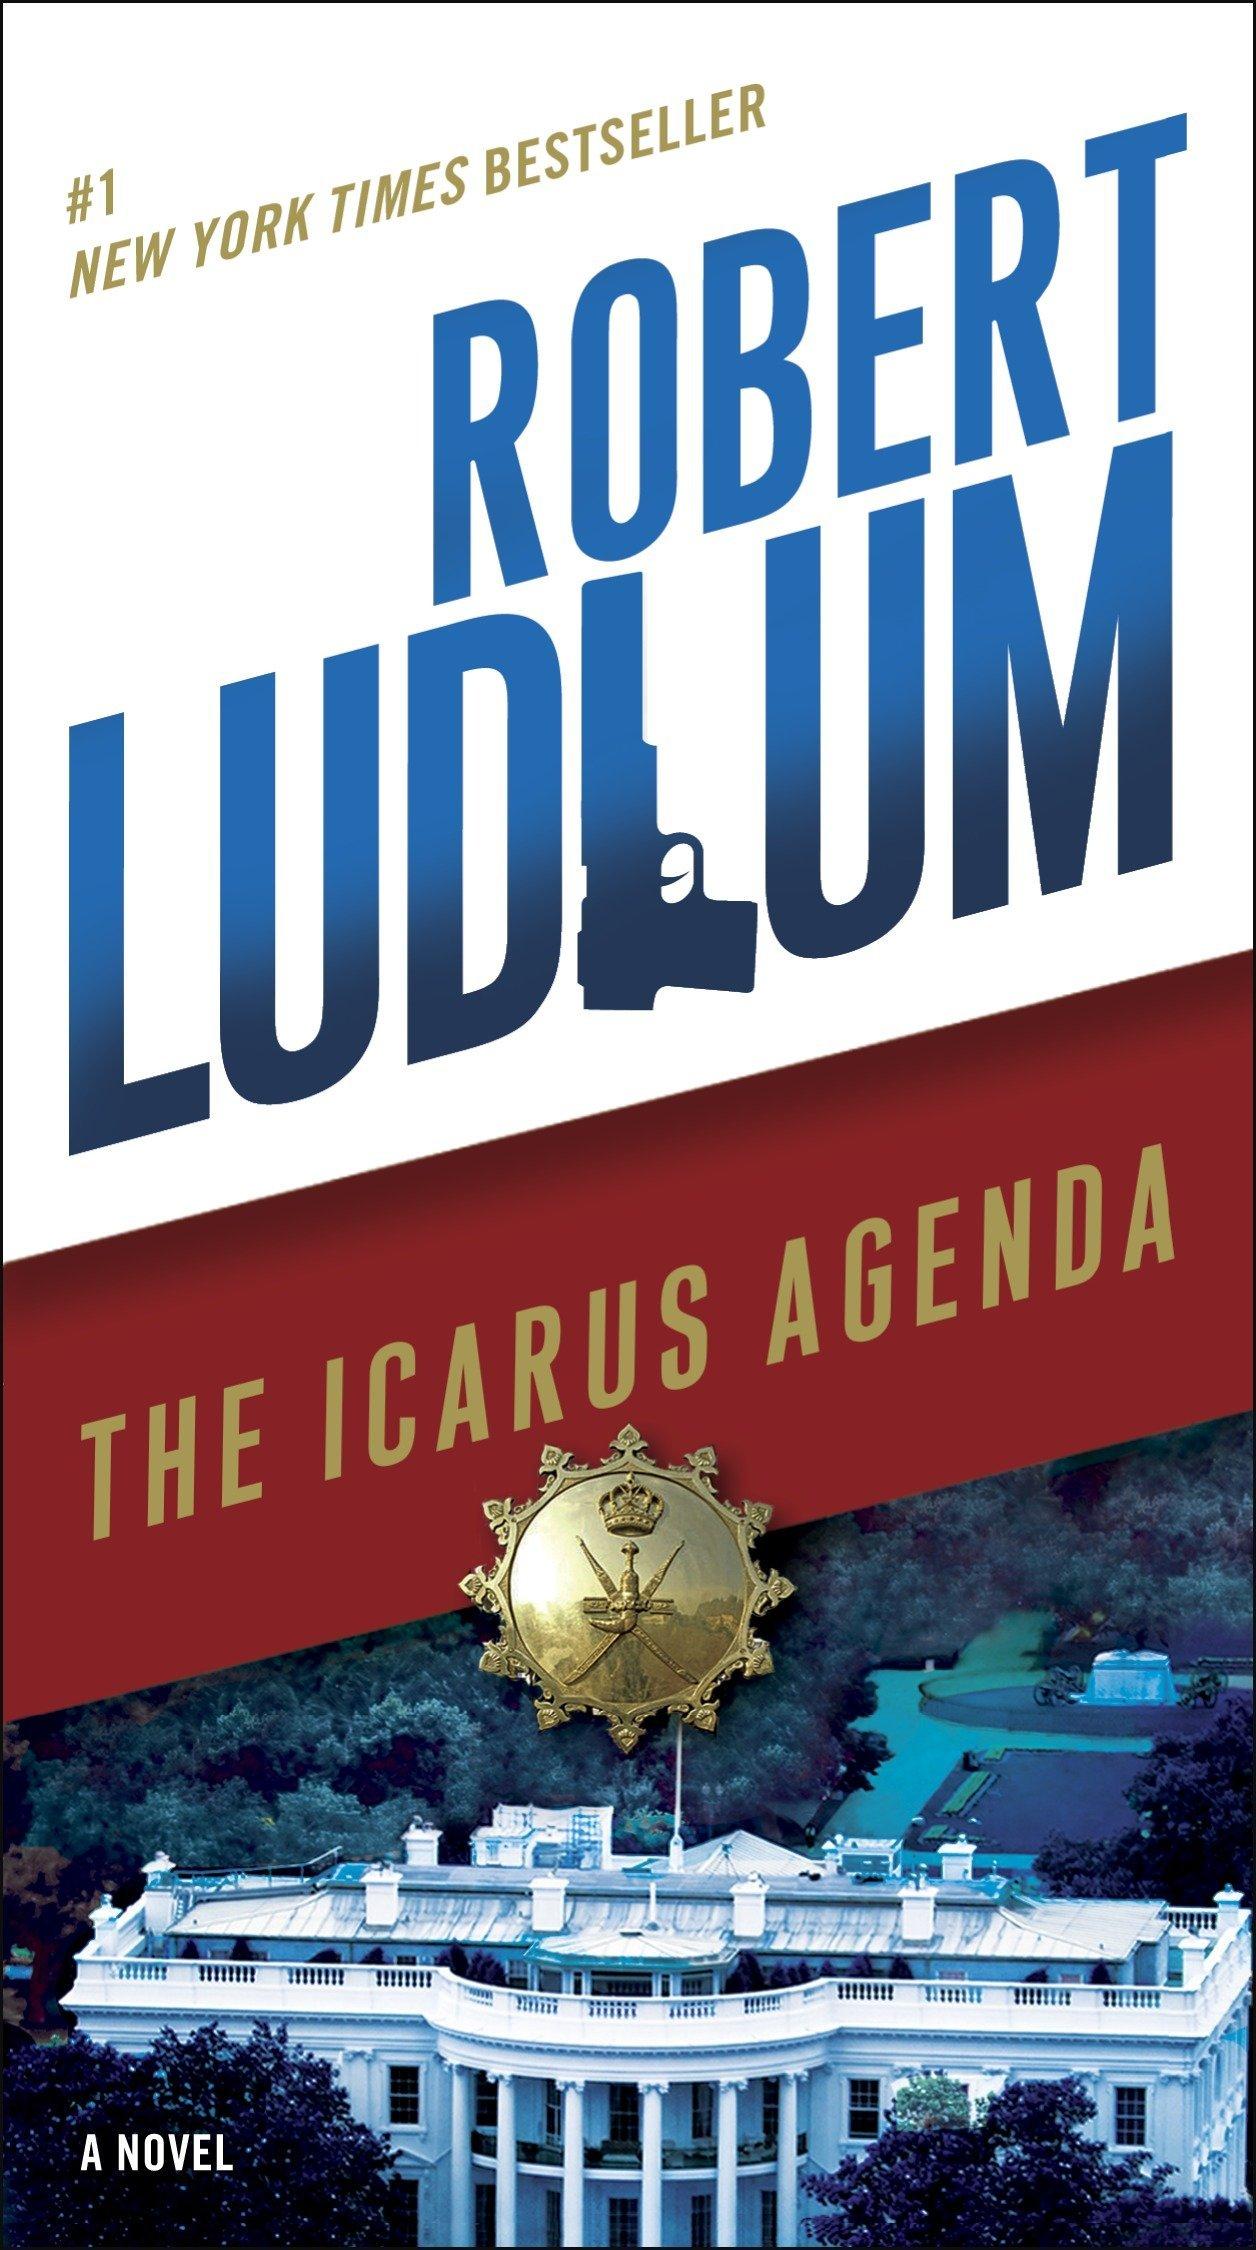 Amazon.com: The Icarus Agenda: A Novel (9780345539212 ...